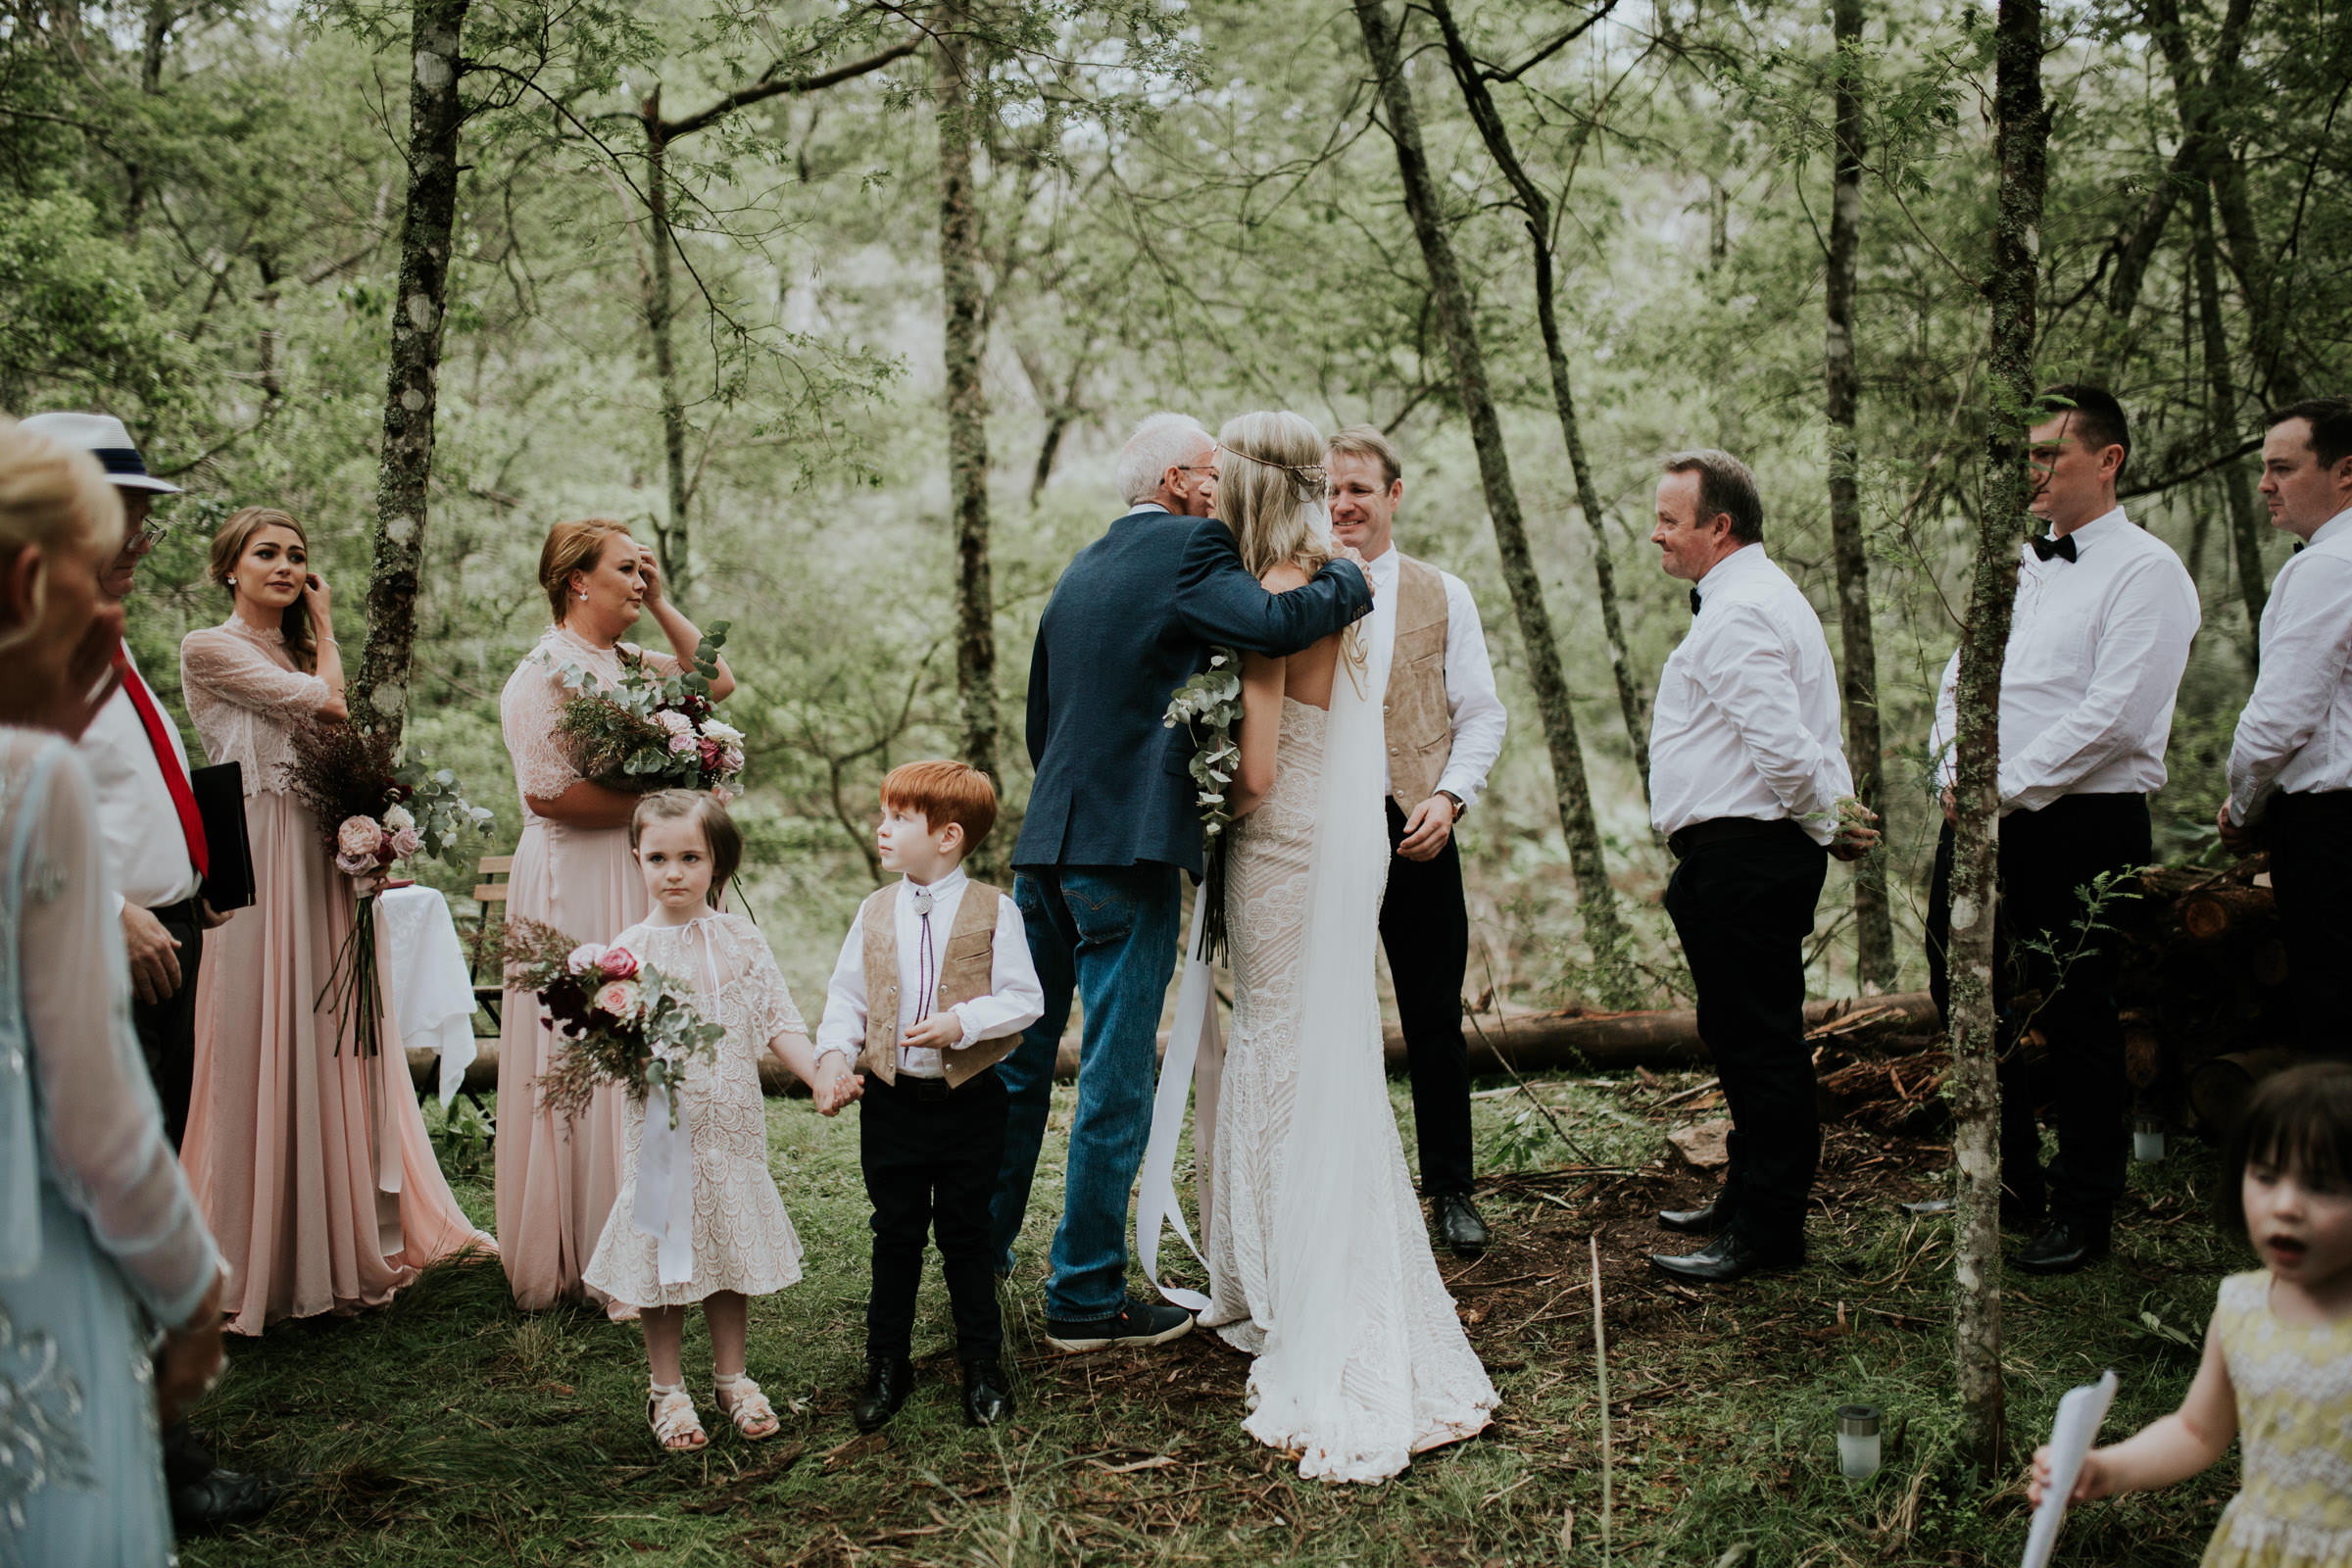 Emma+John+Far+South+Coast+Wedding+Festivl+Glamping+Bush-100.jpg